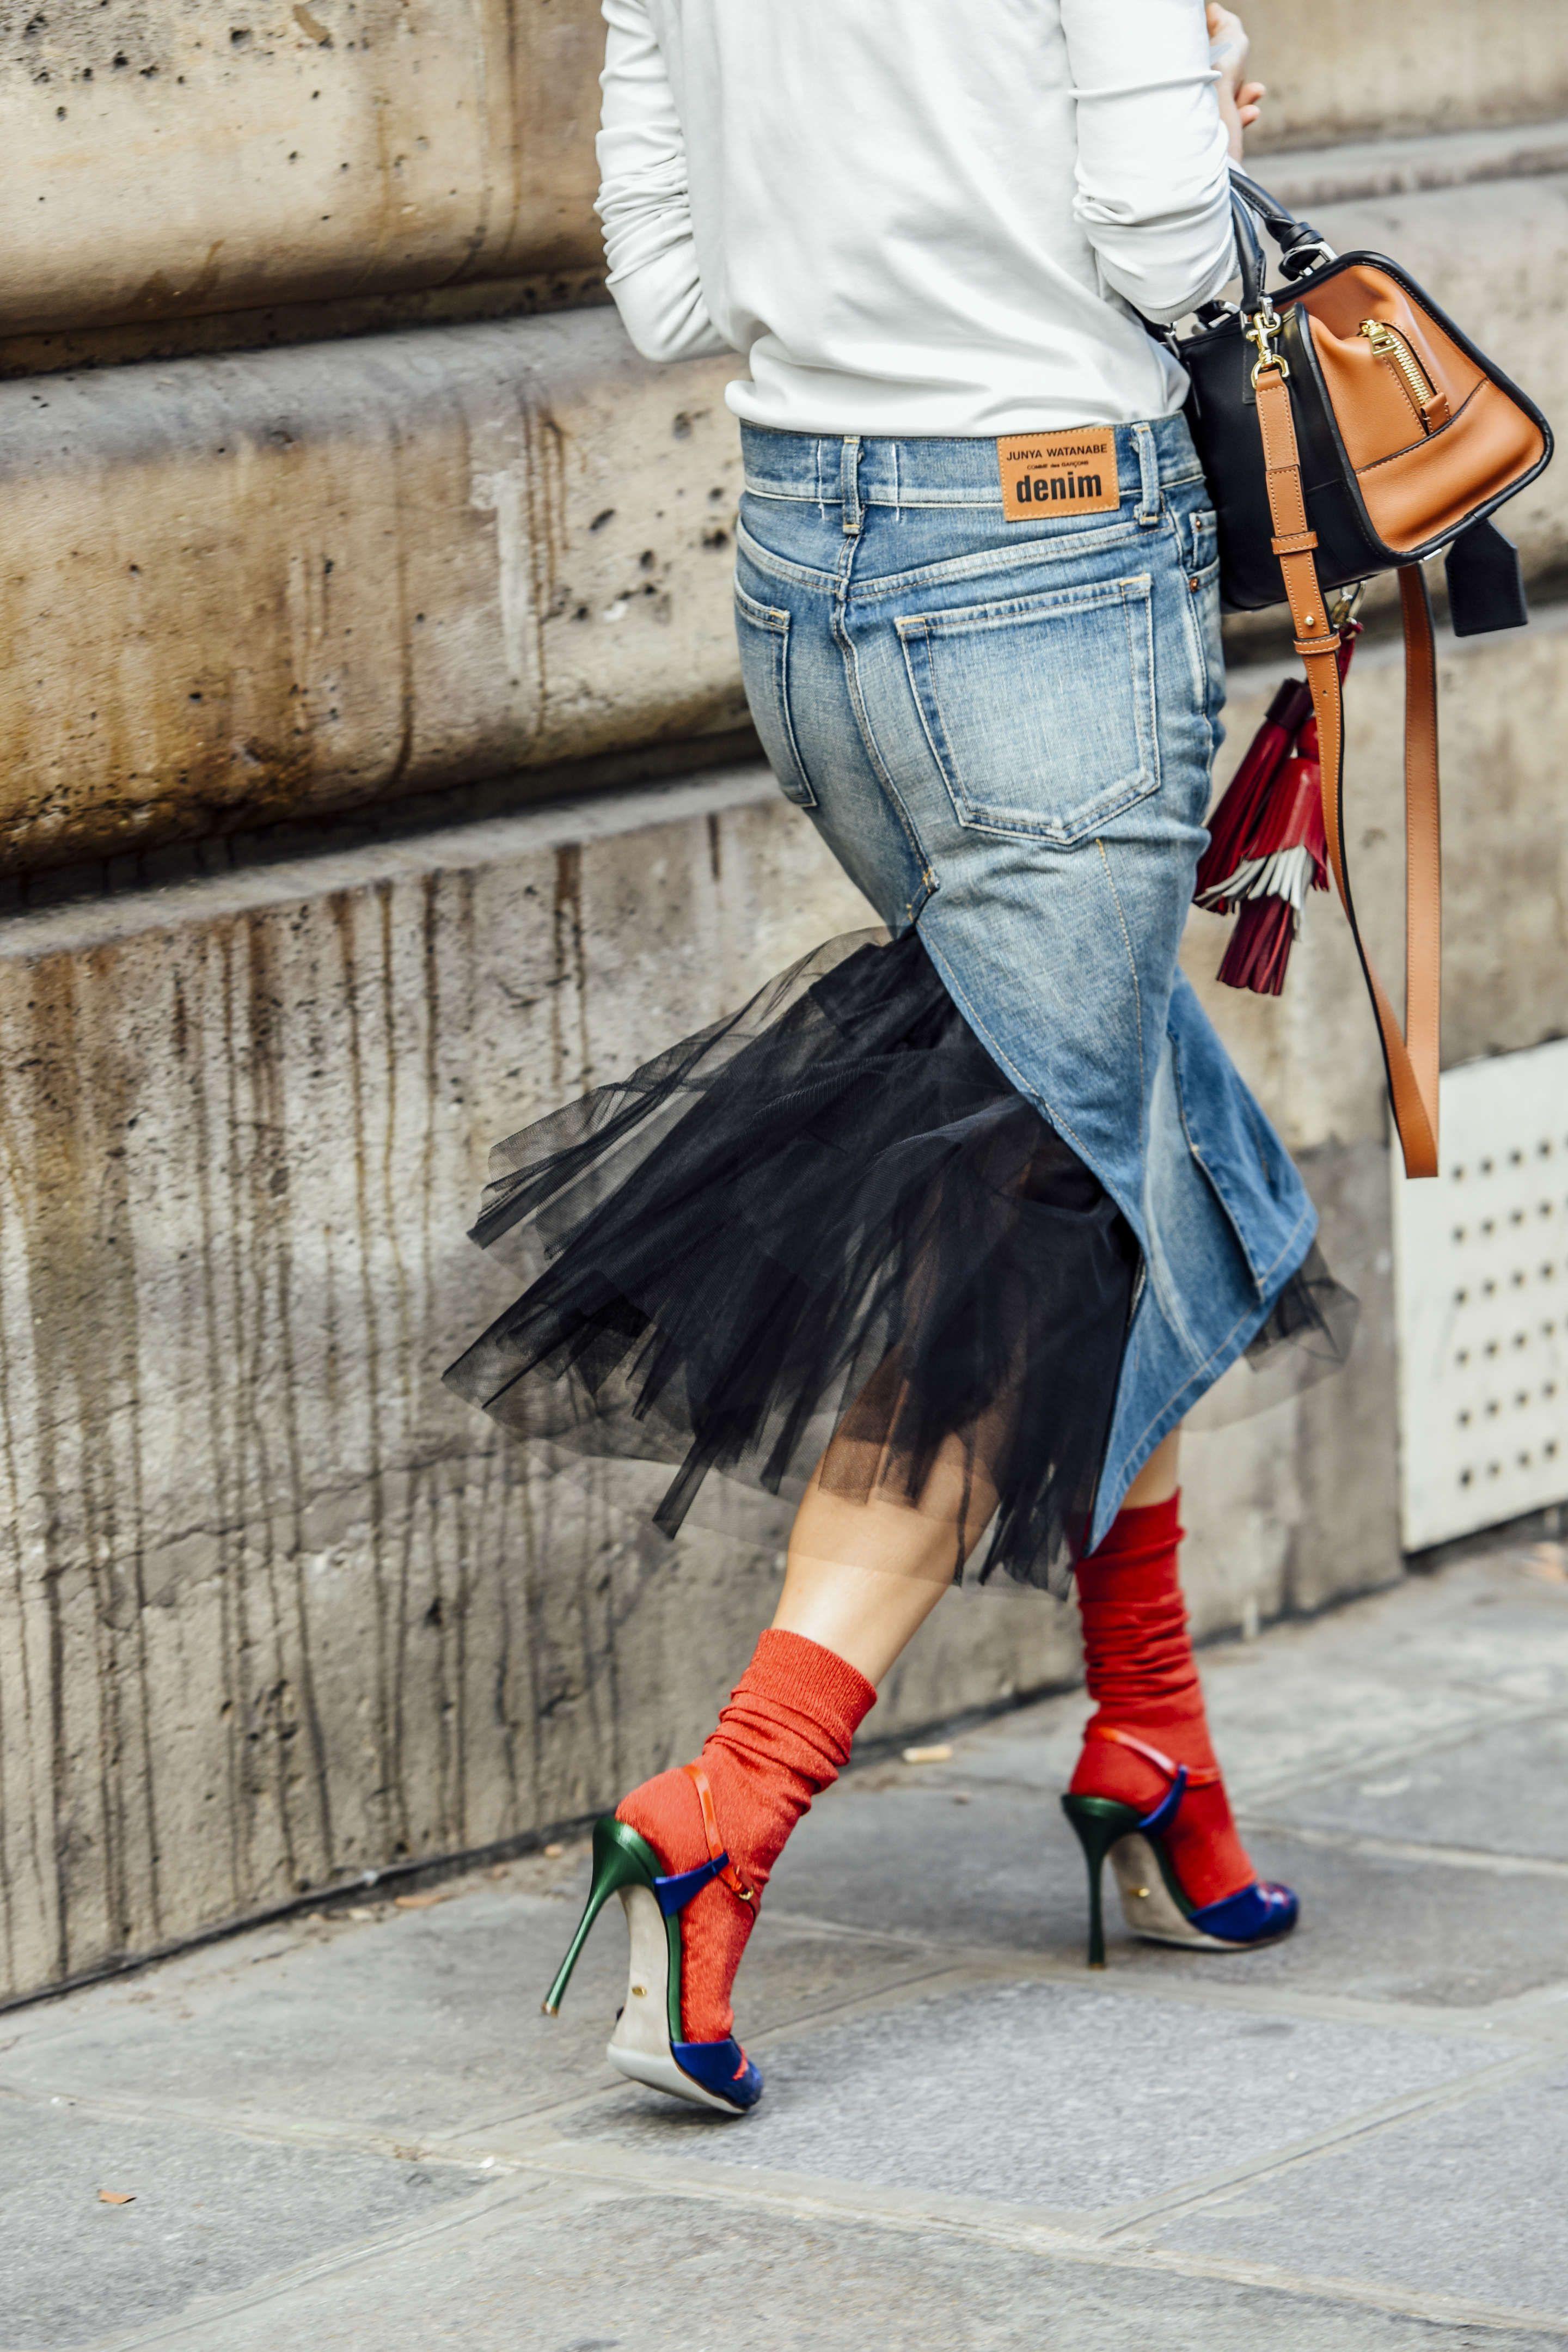 September 27, 2016 Tags Black, Brown, Red, White, Paris, Blue, Denim, Junya Watanabe, Women, High Heels, Bags, Skirts, Socks, Tulle, Comme des Garçons, Flared, SS17 Women's